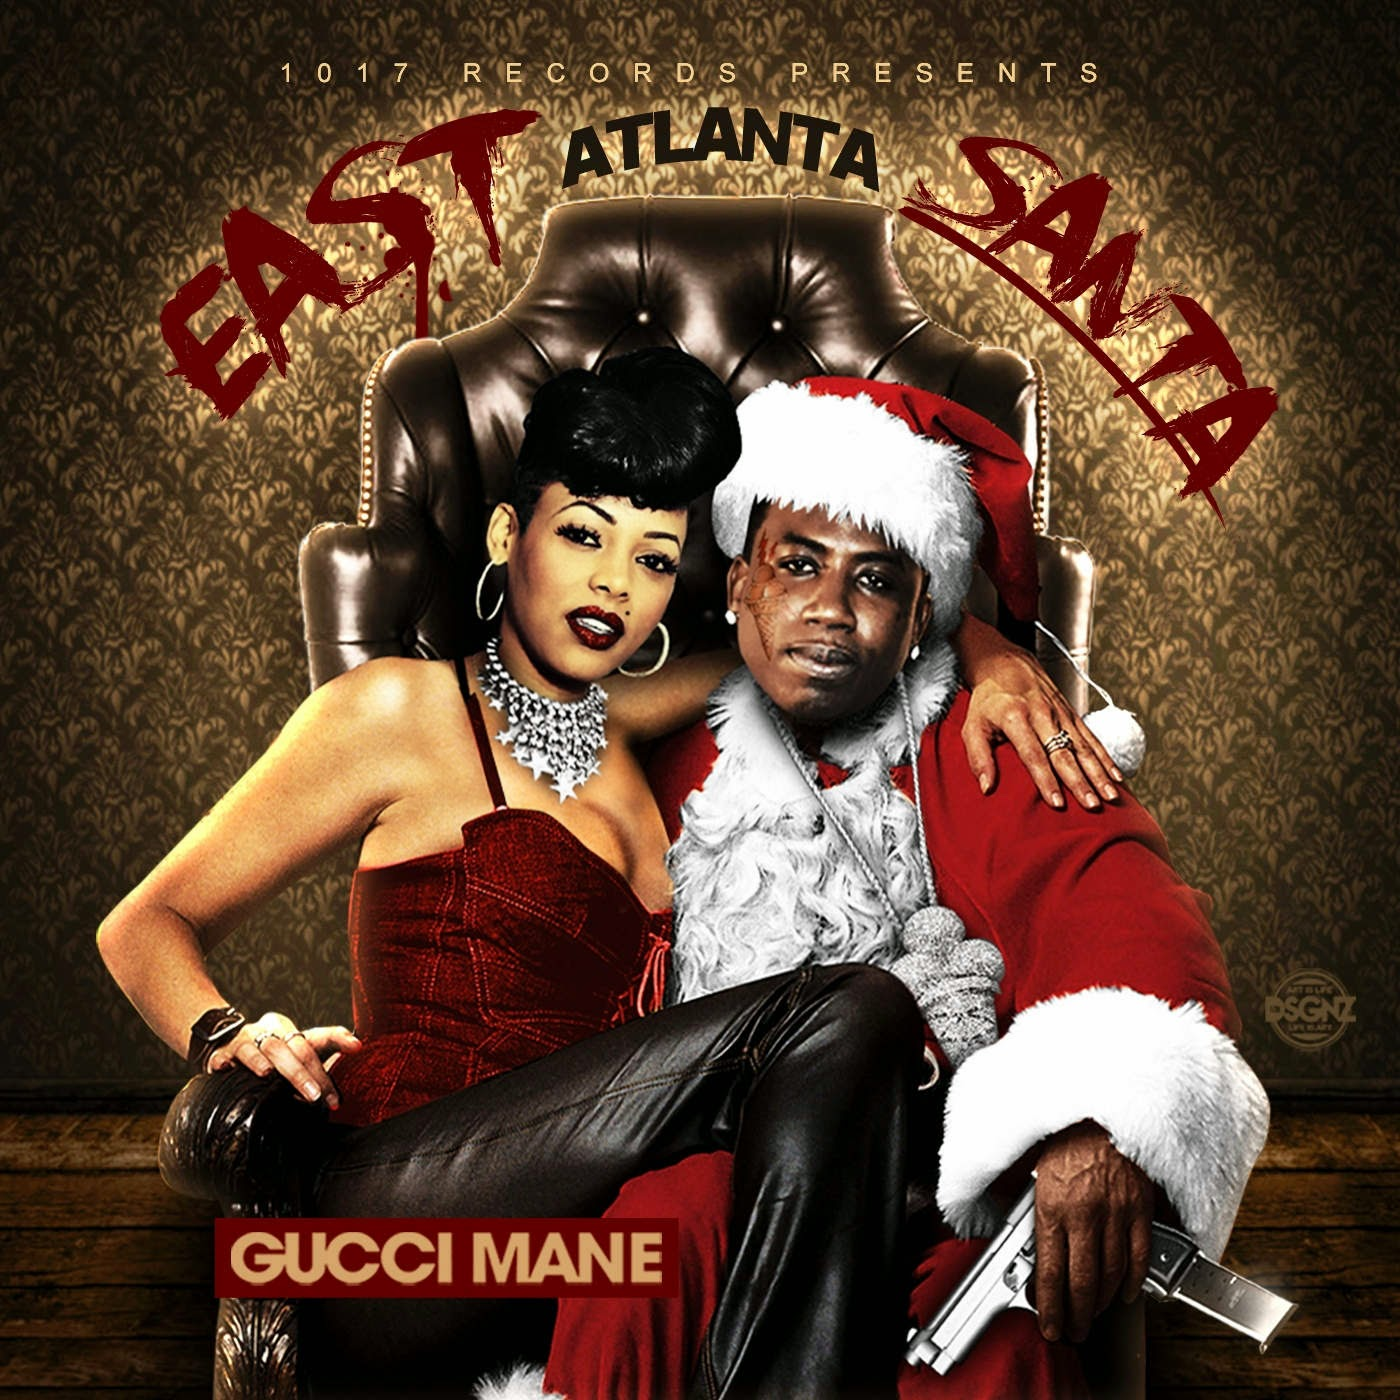 Gucci Mane - East Atlanta Santa Cover